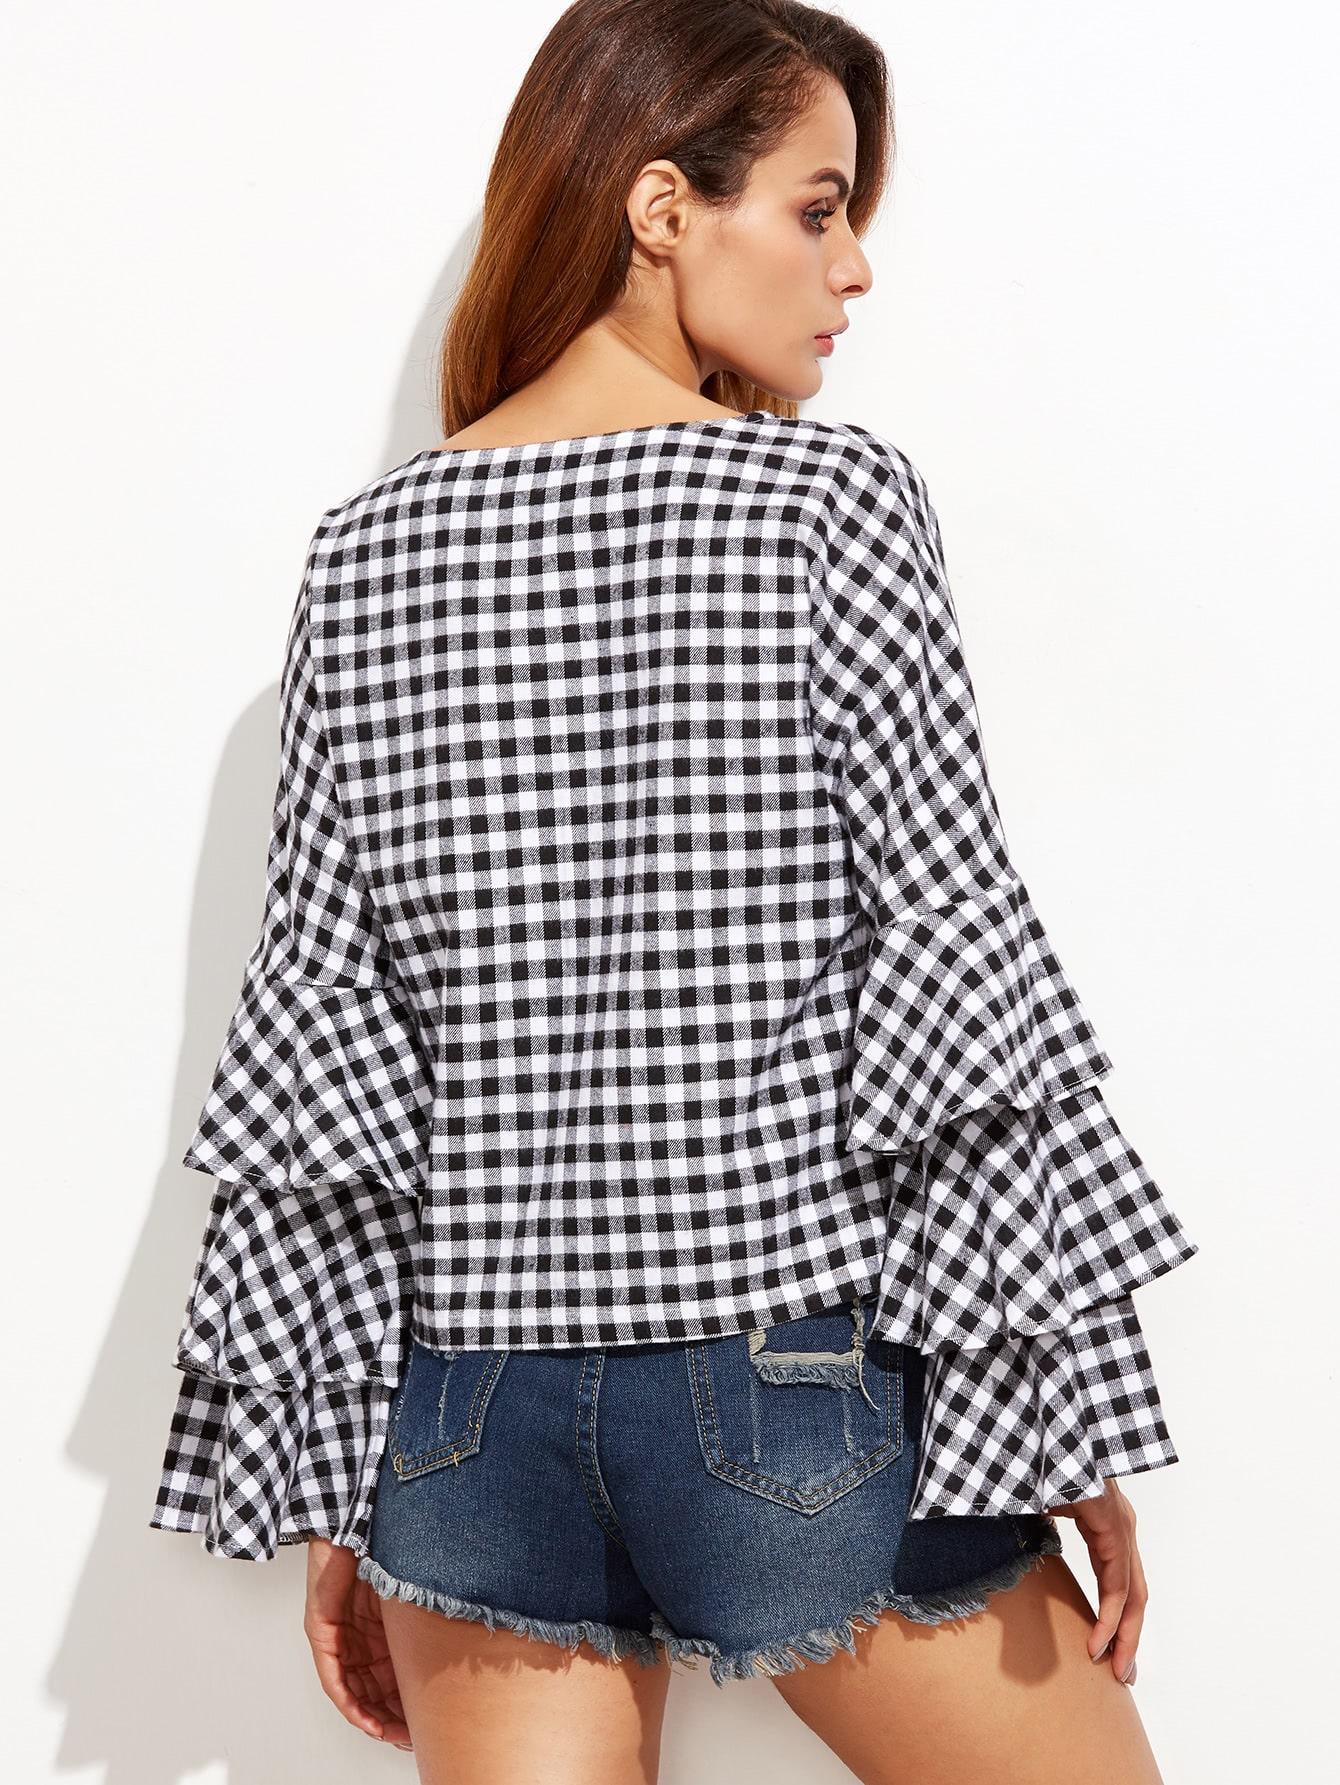 blouse161011709_2